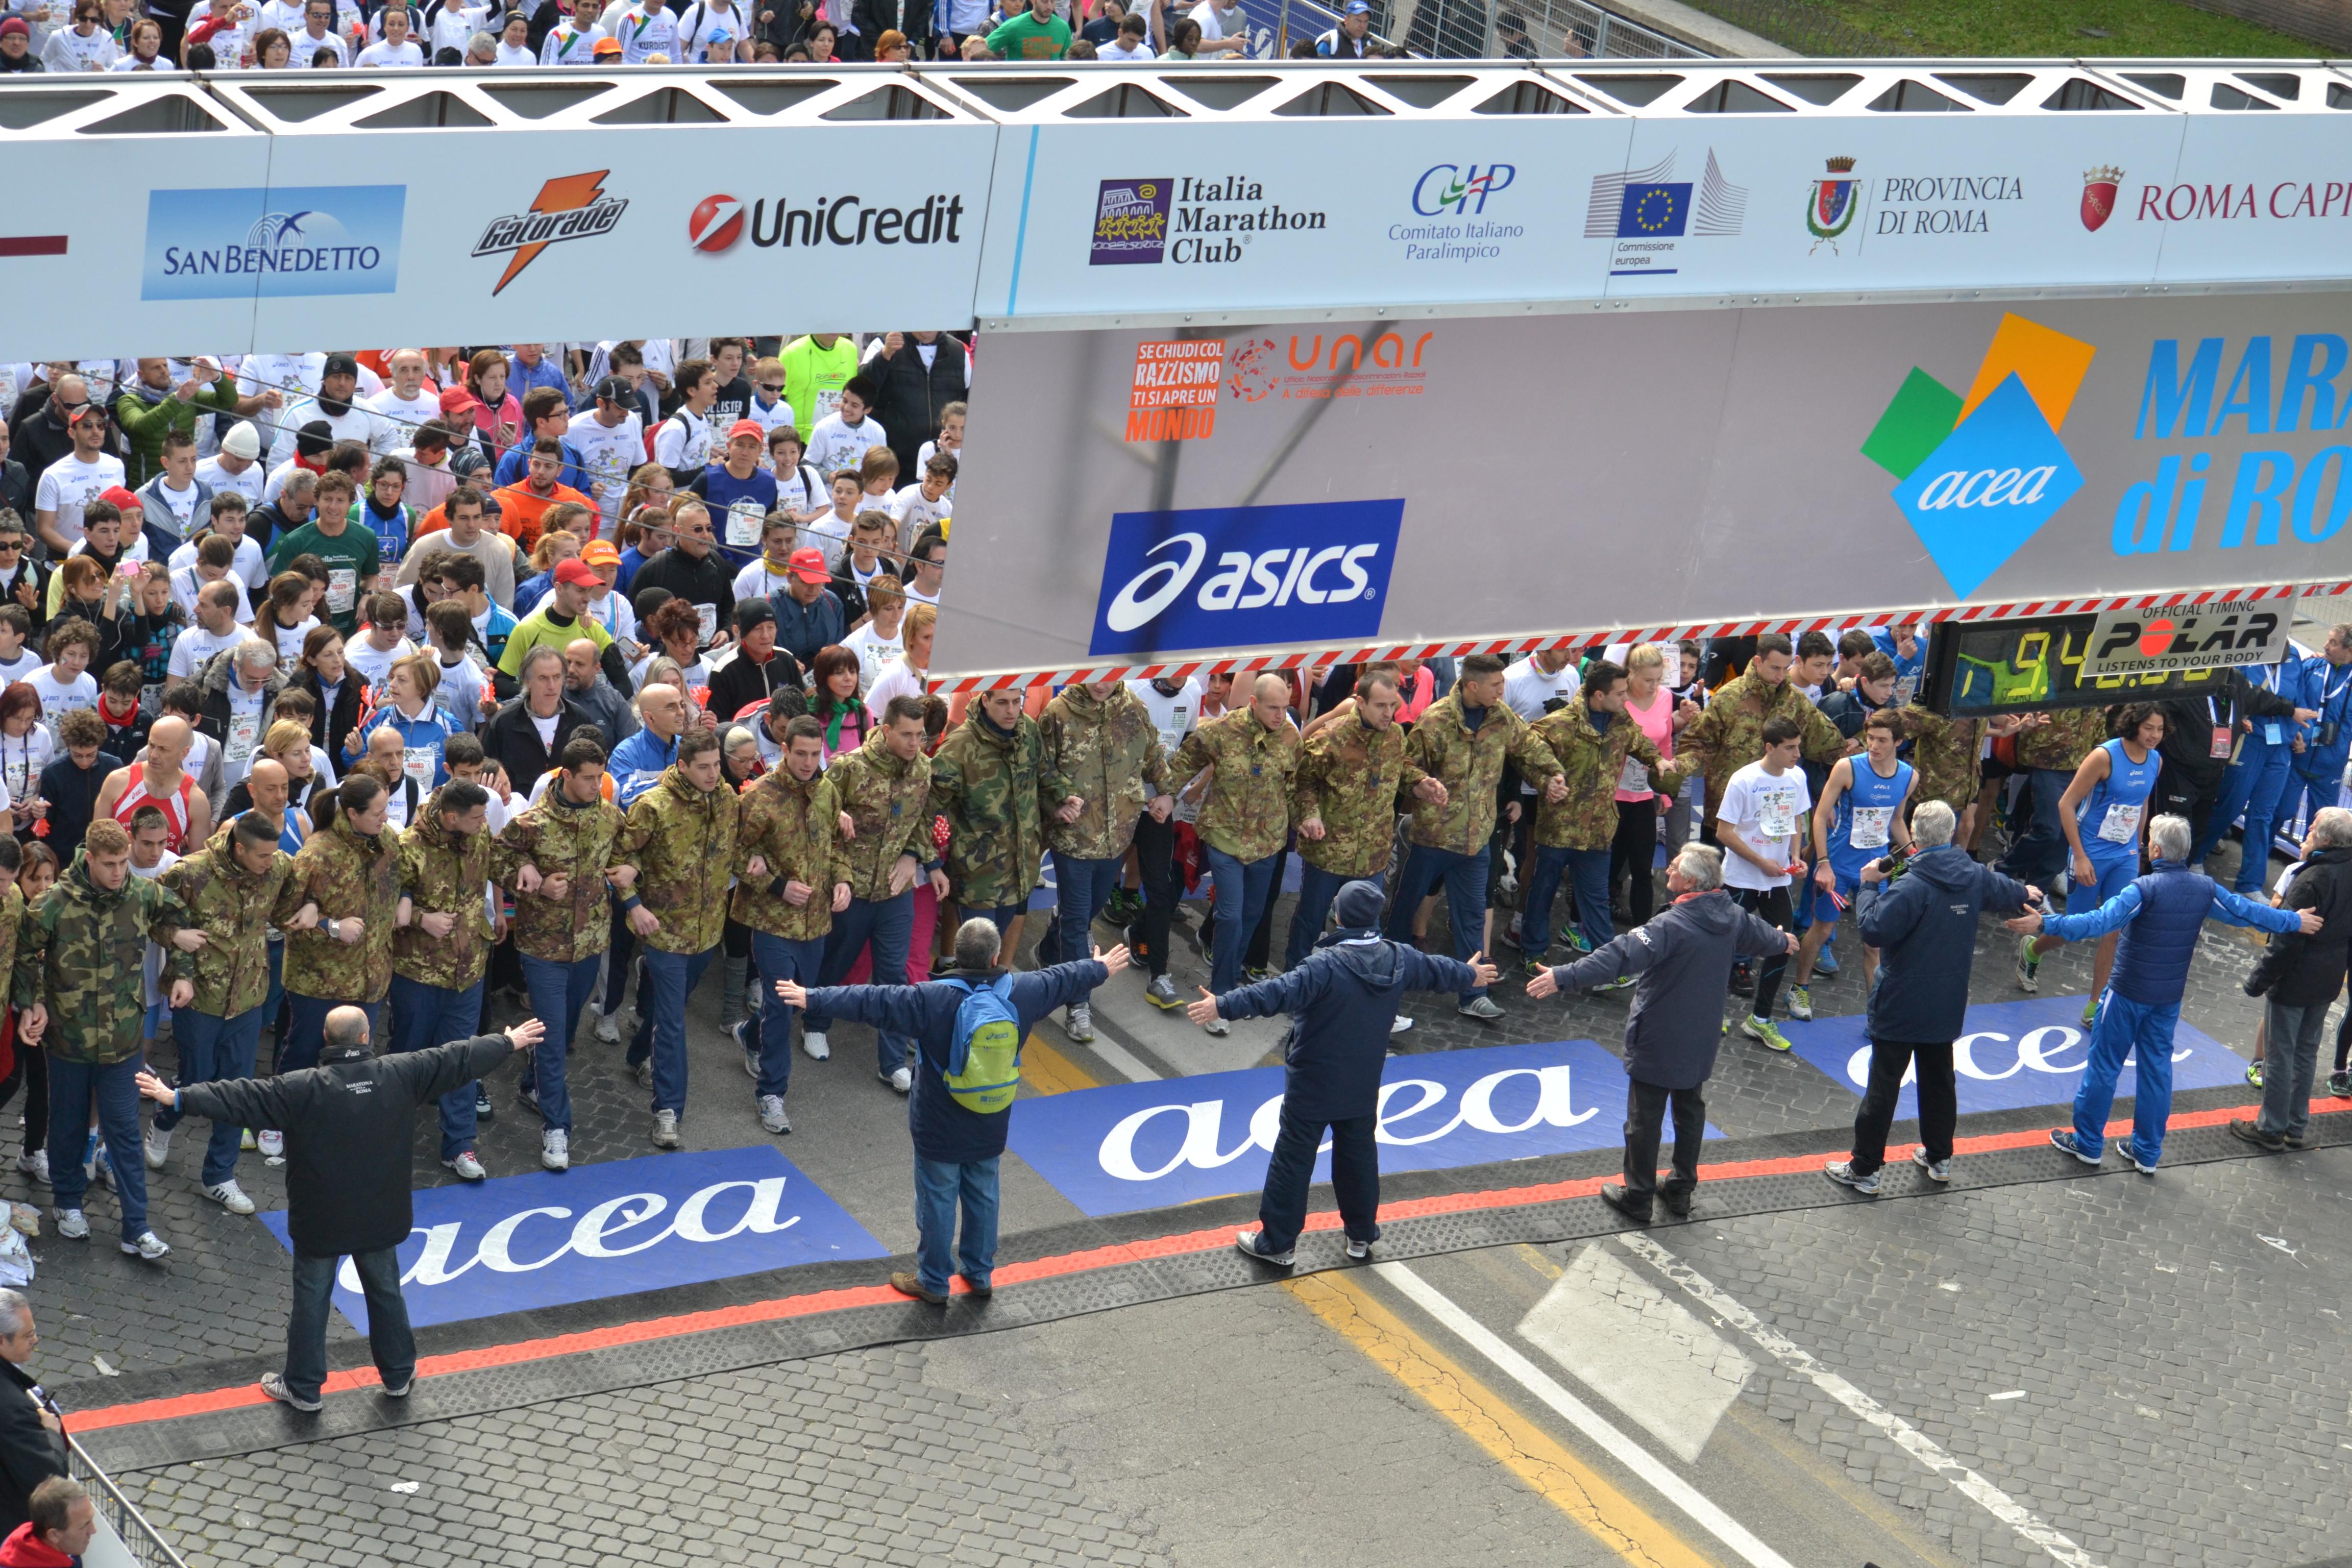 maratona-di-roma-2013-369